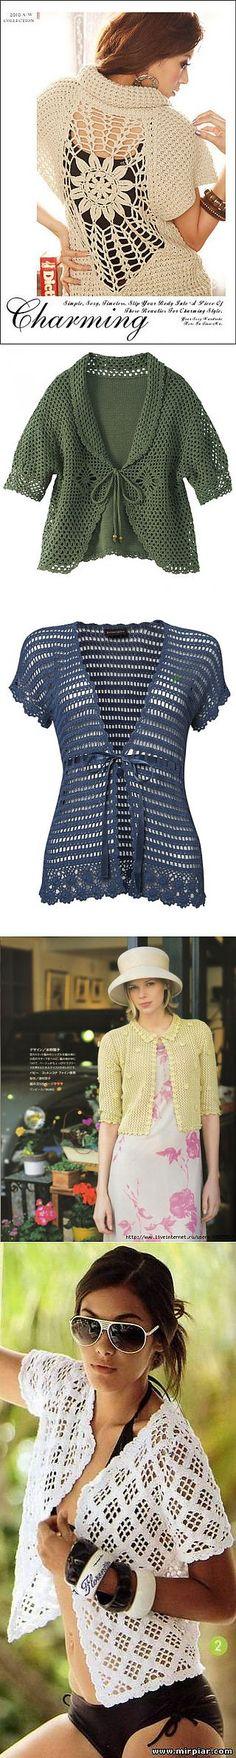 liveinternet.ru Crochet Jacket, Crochet Cardigan, Crochet Shawl, Knit Crochet, Crotchet Dress, Shrugs And Boleros, Crochet Clothes, Pull, Crochet Patterns